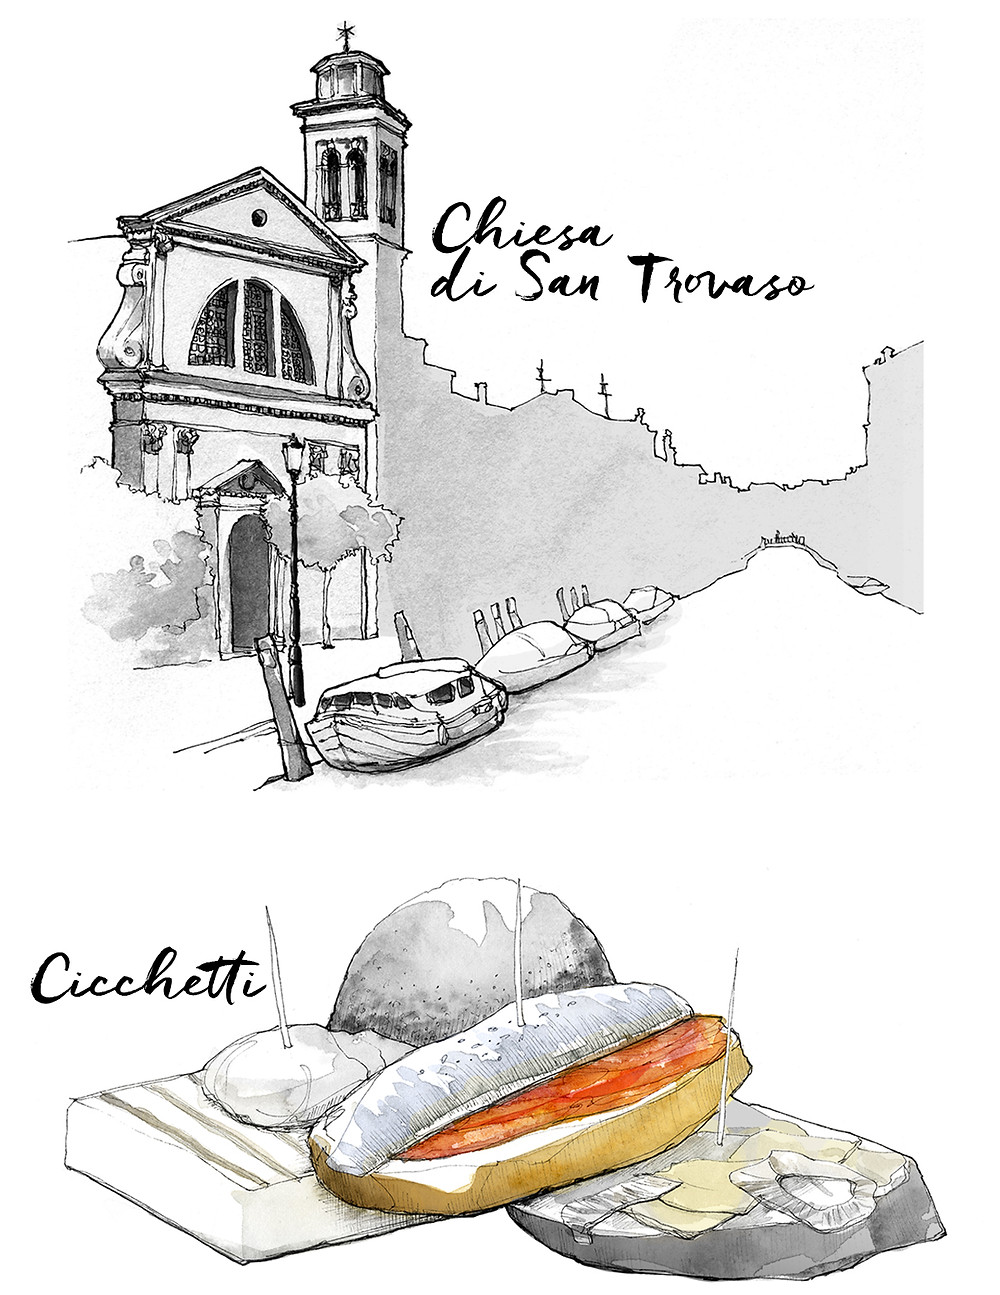 Blog Travel Italiy Marcellooo.fr Venice itinerary advices addresses drawing Jdan